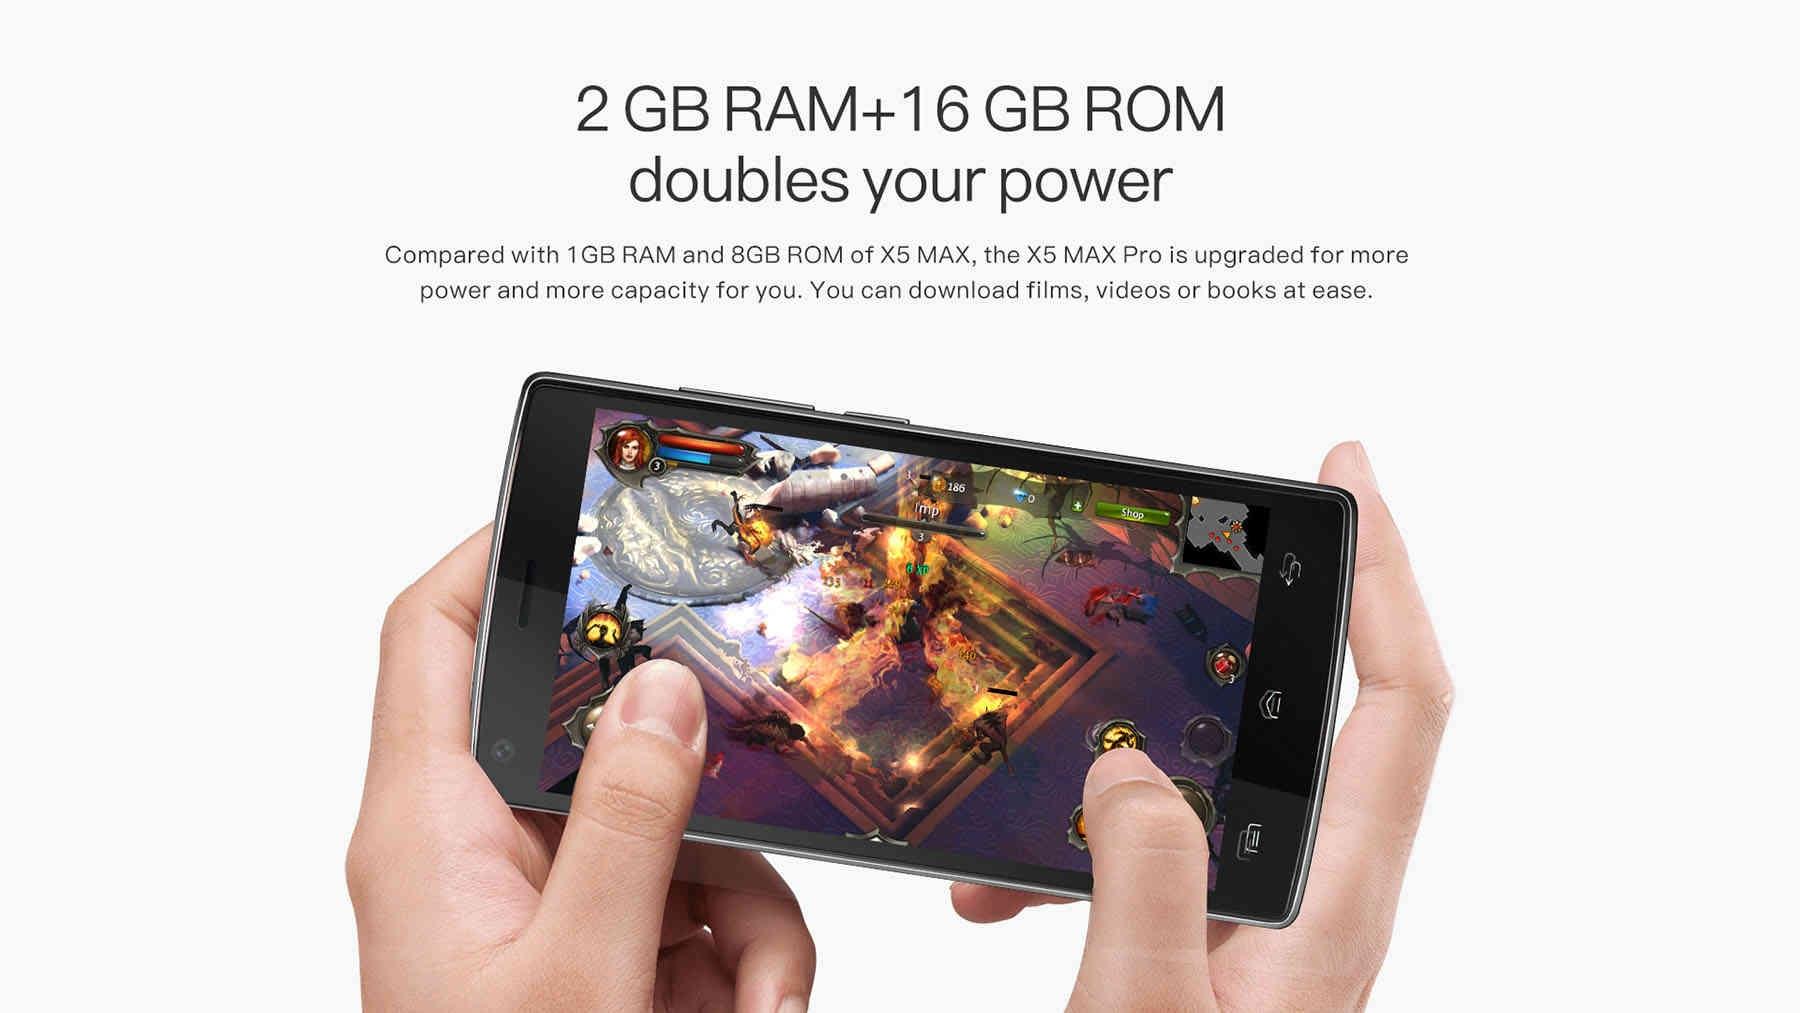 DOOGEE X5 MAX Pro 5.0 inch 4G Smartphone Android 6.0 MTK6737 Quad Core 1.3GHz 2GB RAM 16GB ROM Fingerprint Sensor Sensor Cameras Bluetooth 4.0 4000mAh Battery